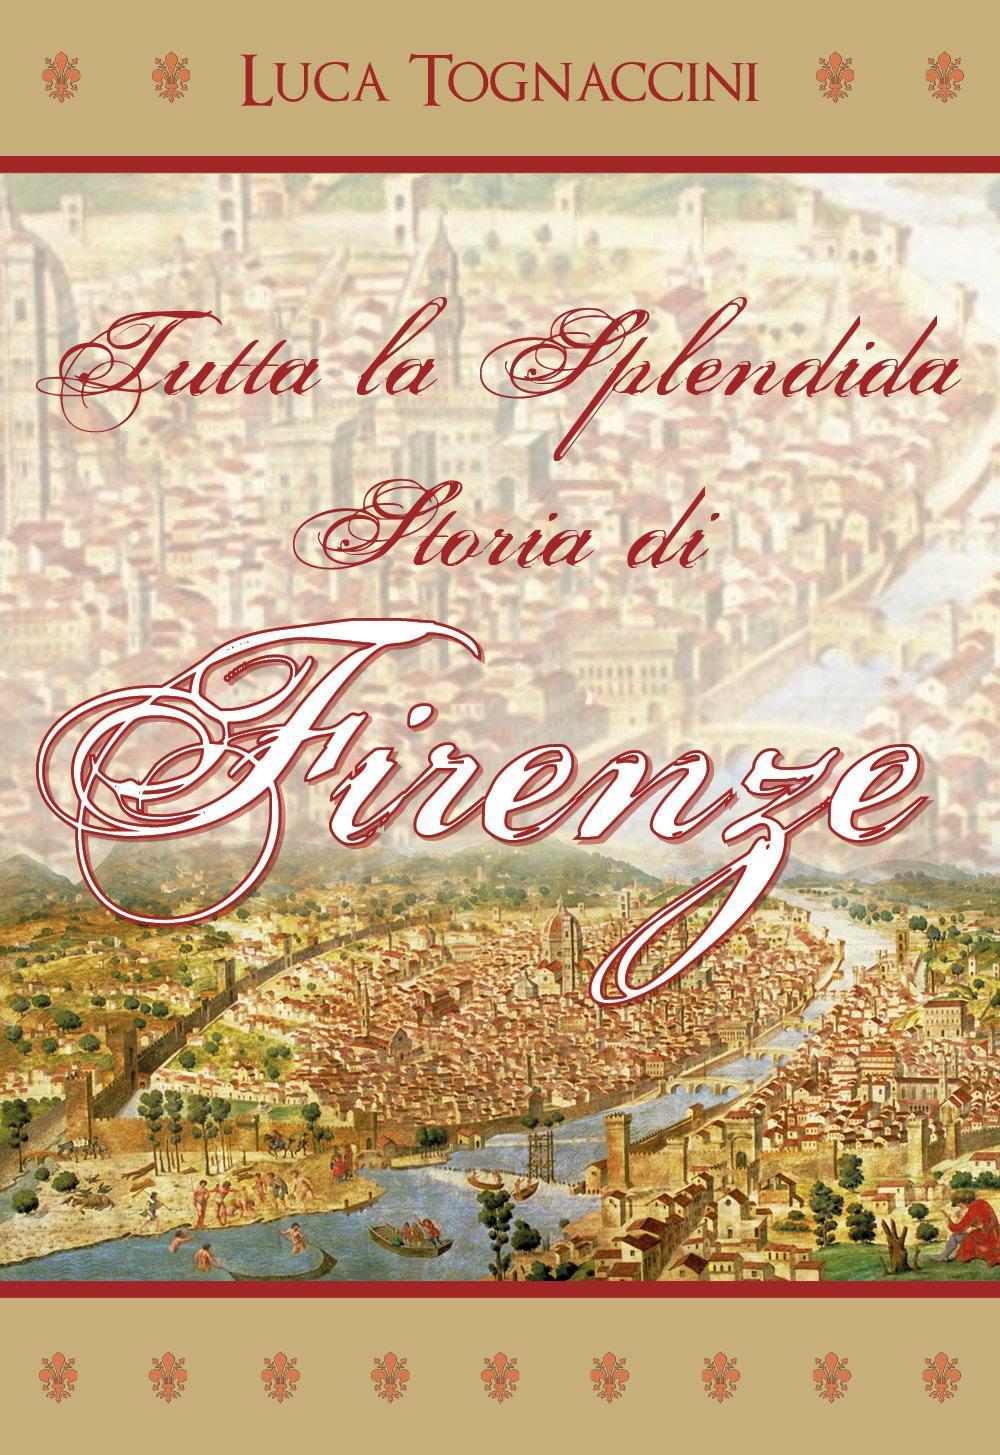 Tutta la Splendida Storia di Firenze